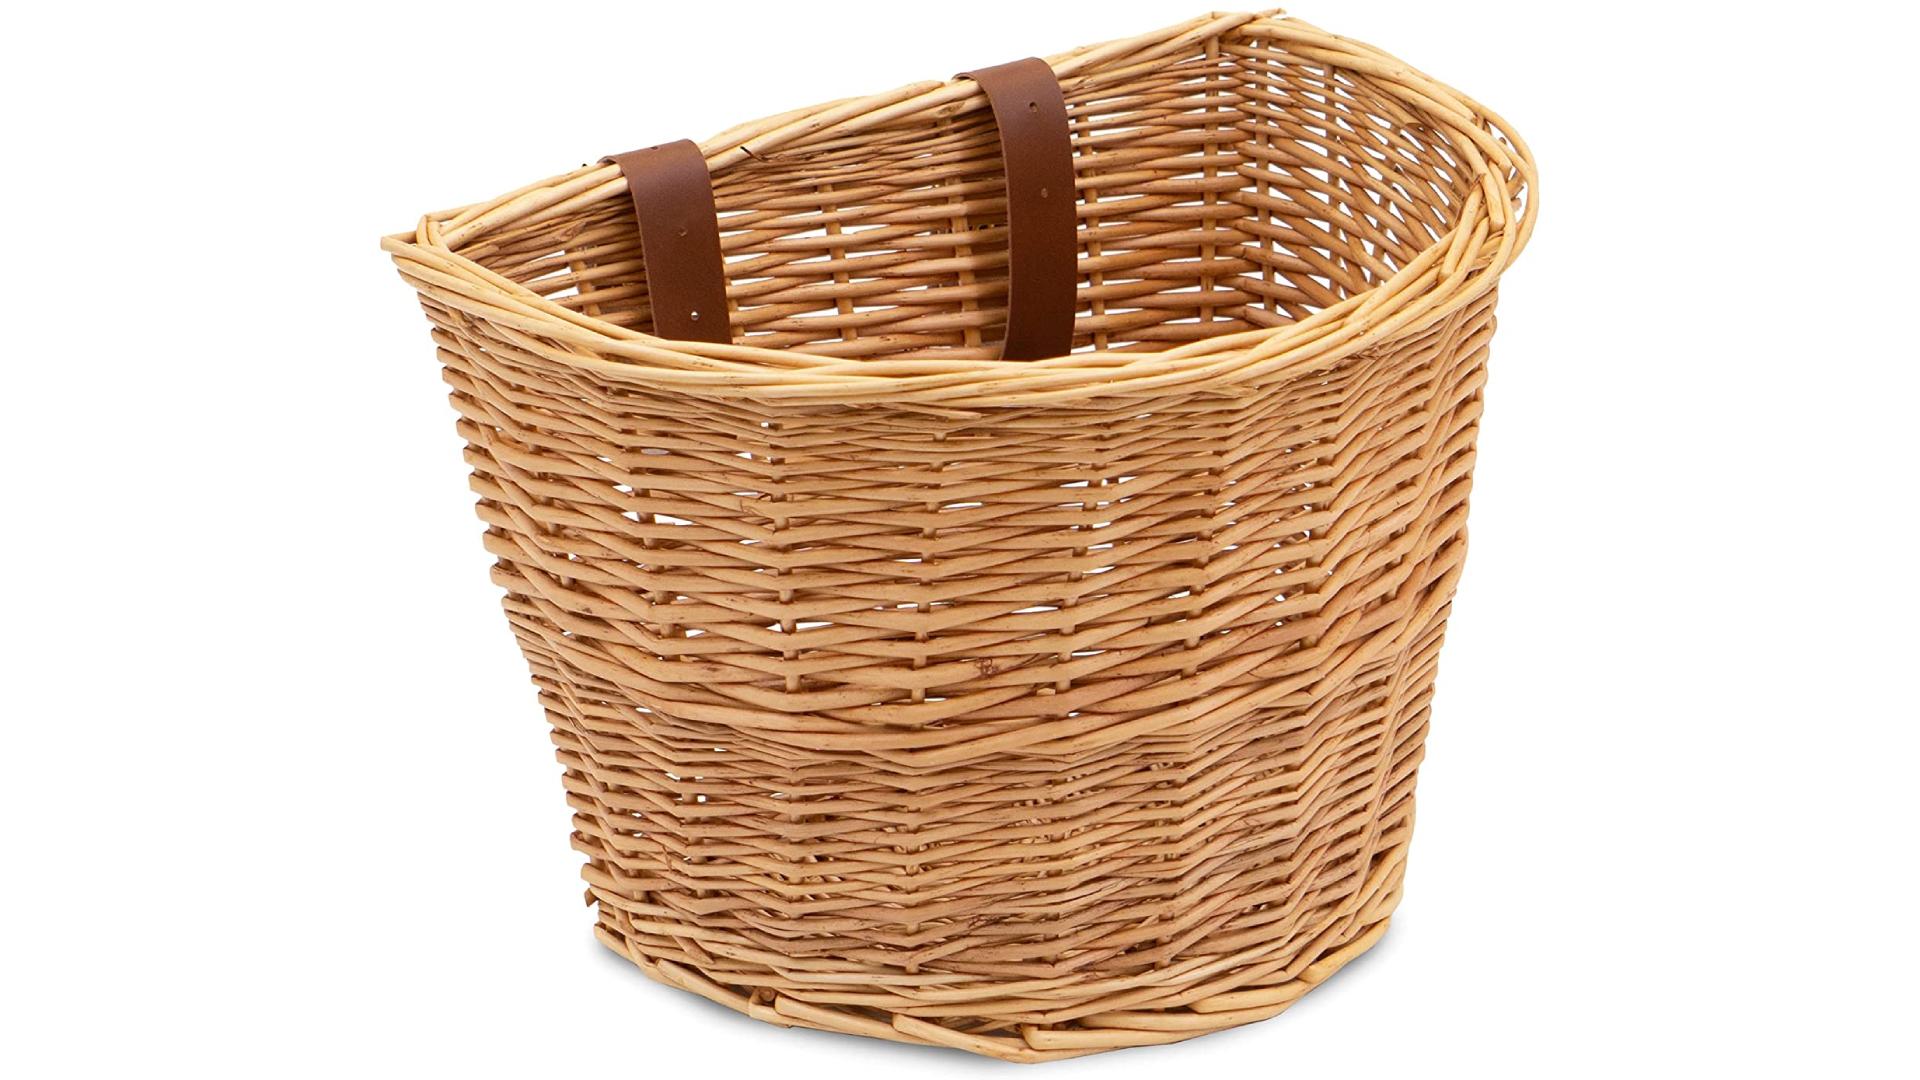 a wicker basket in a semi-circle shape